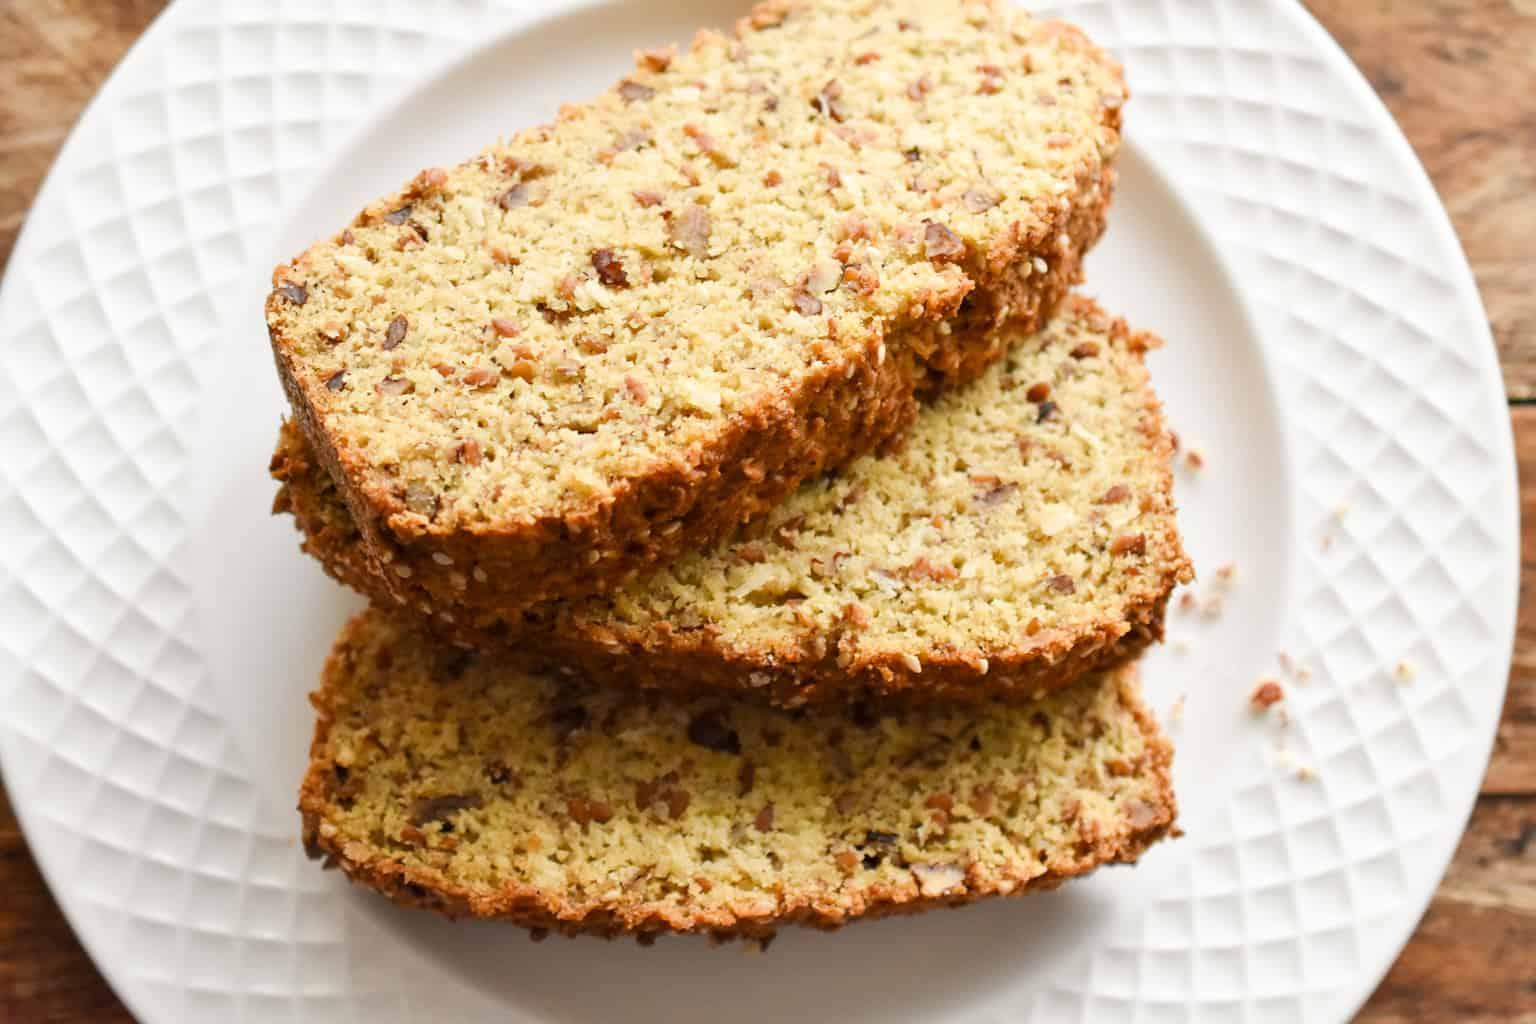 keto high fiber bread loaf three slices